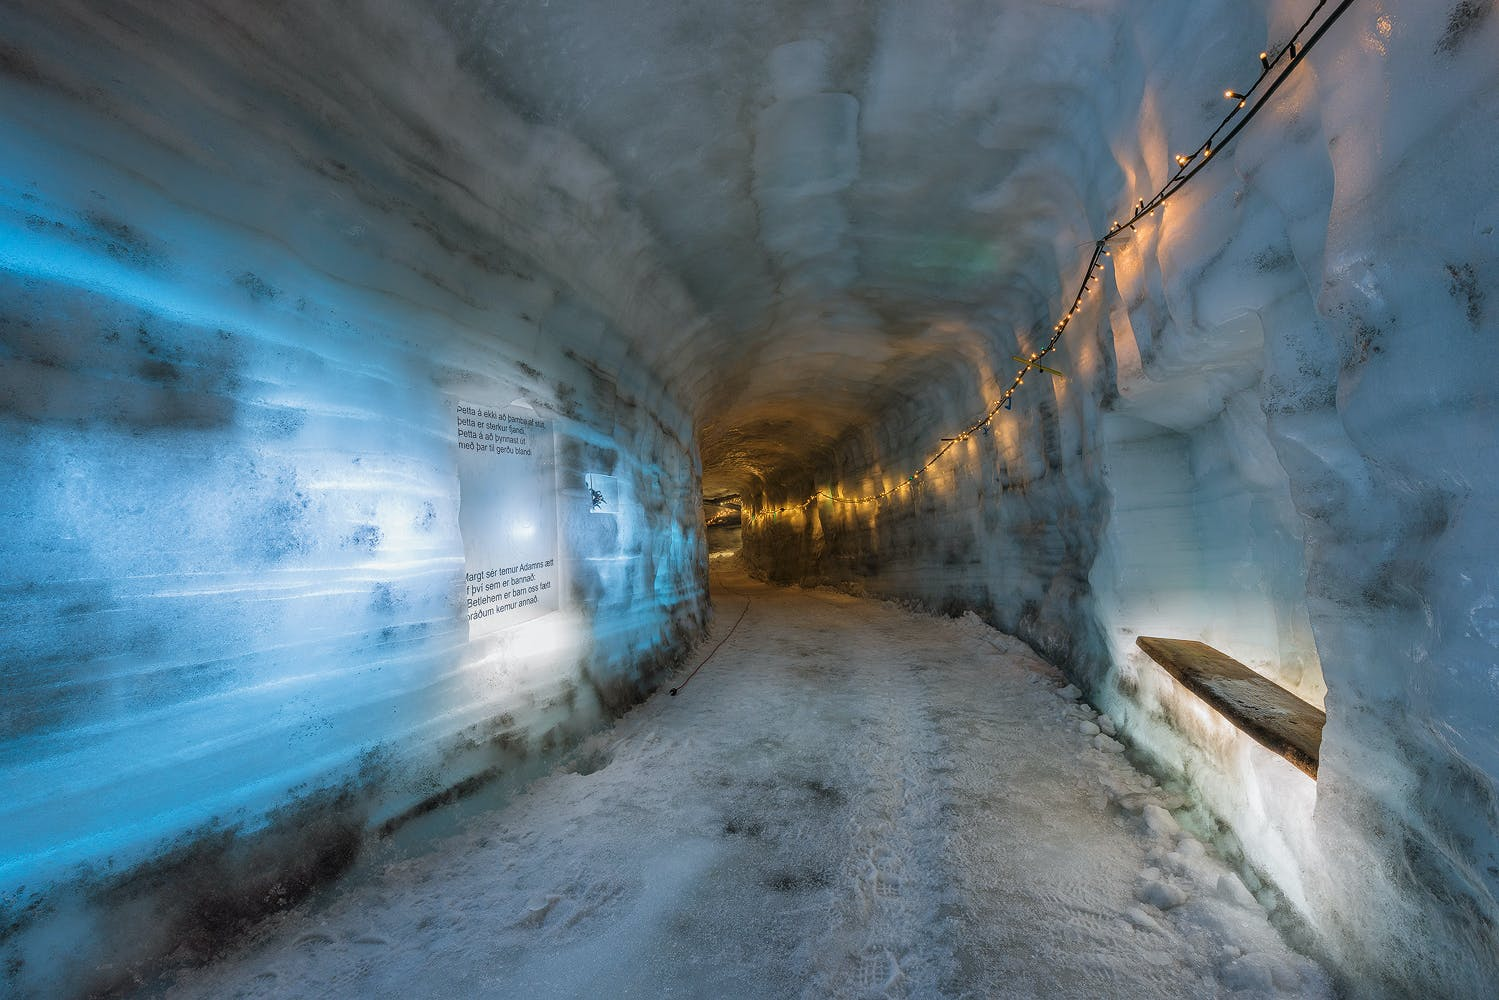 Golden Circle with Langjokull Ice Tunnel